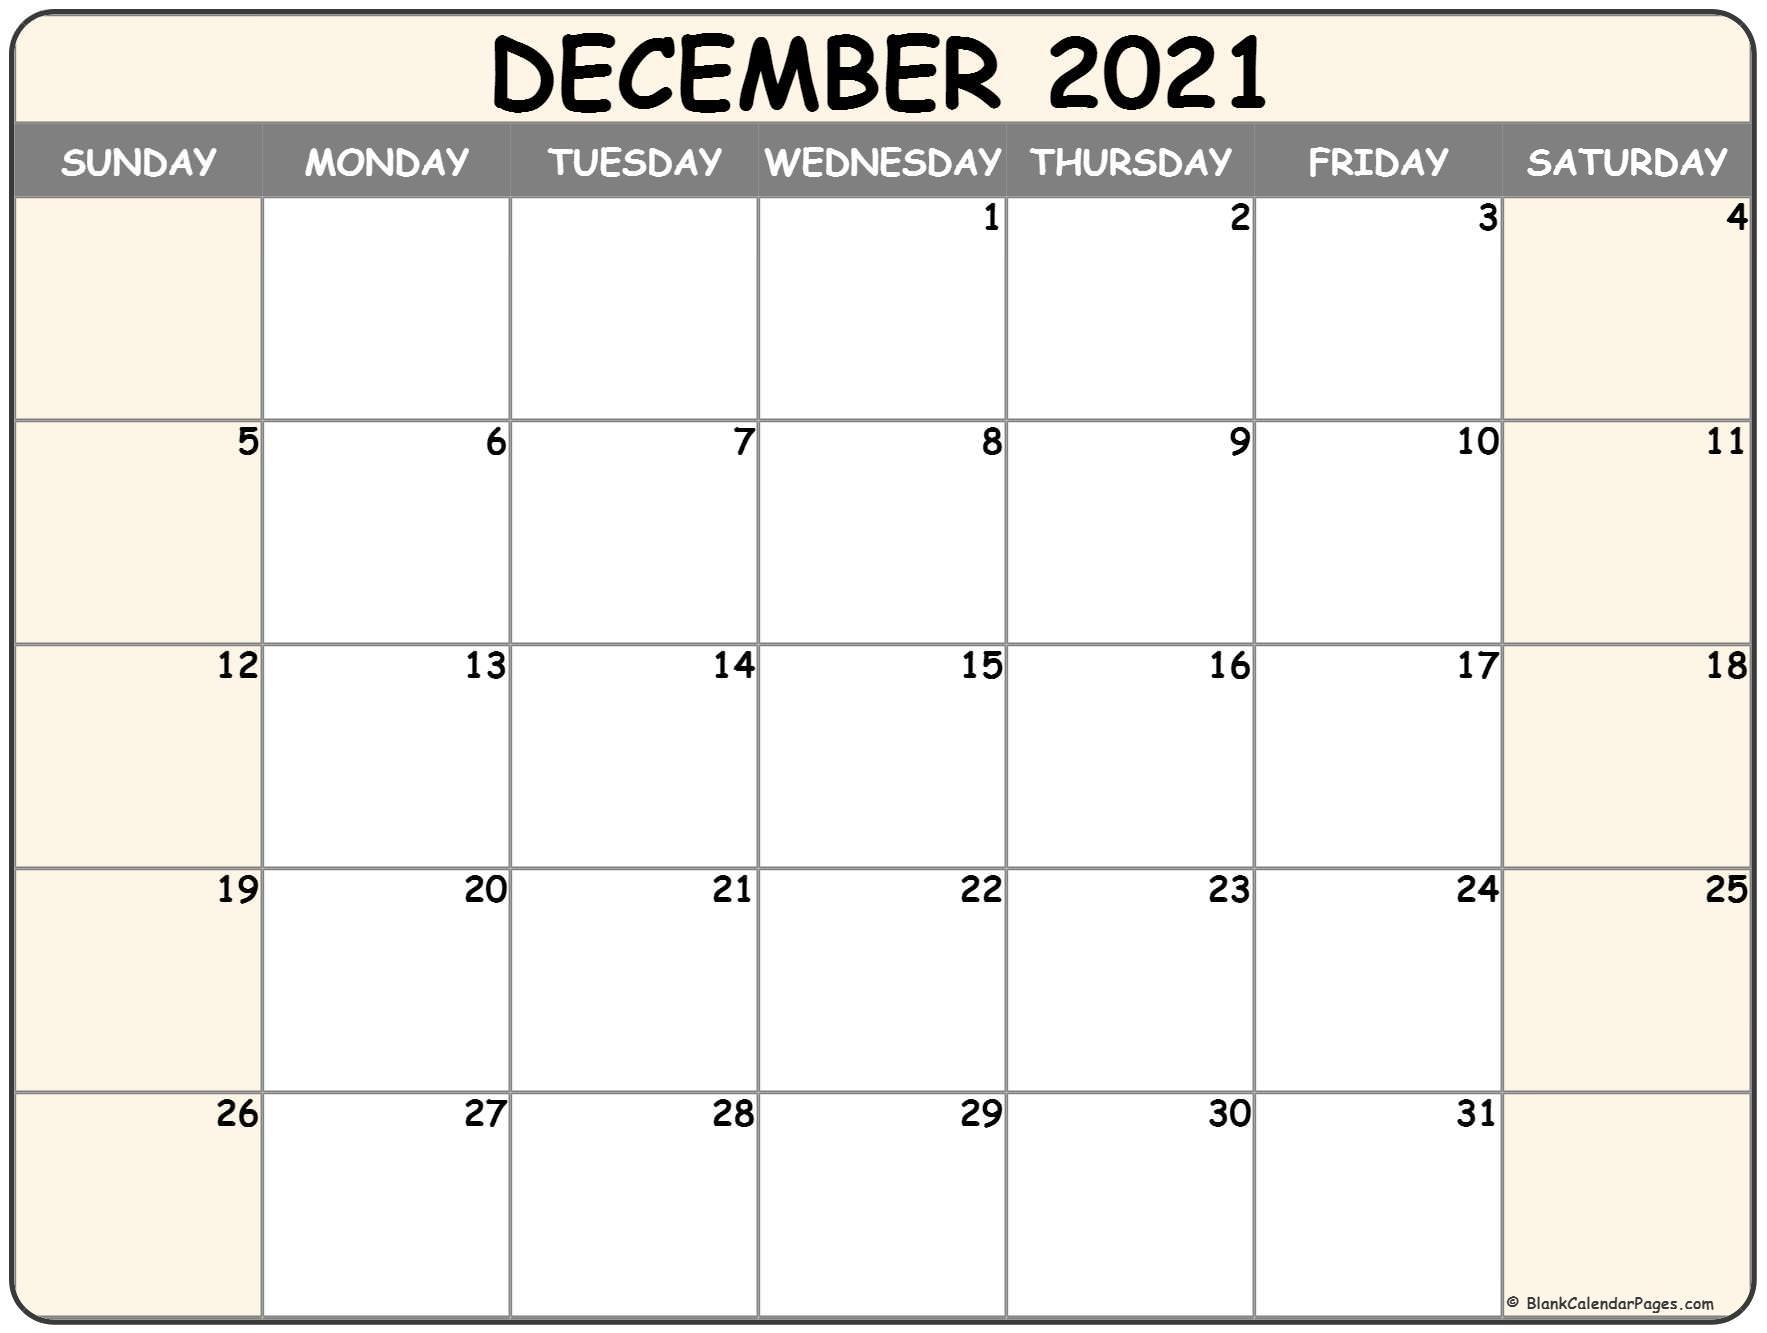 Get Festive 2021 Printable Calendars